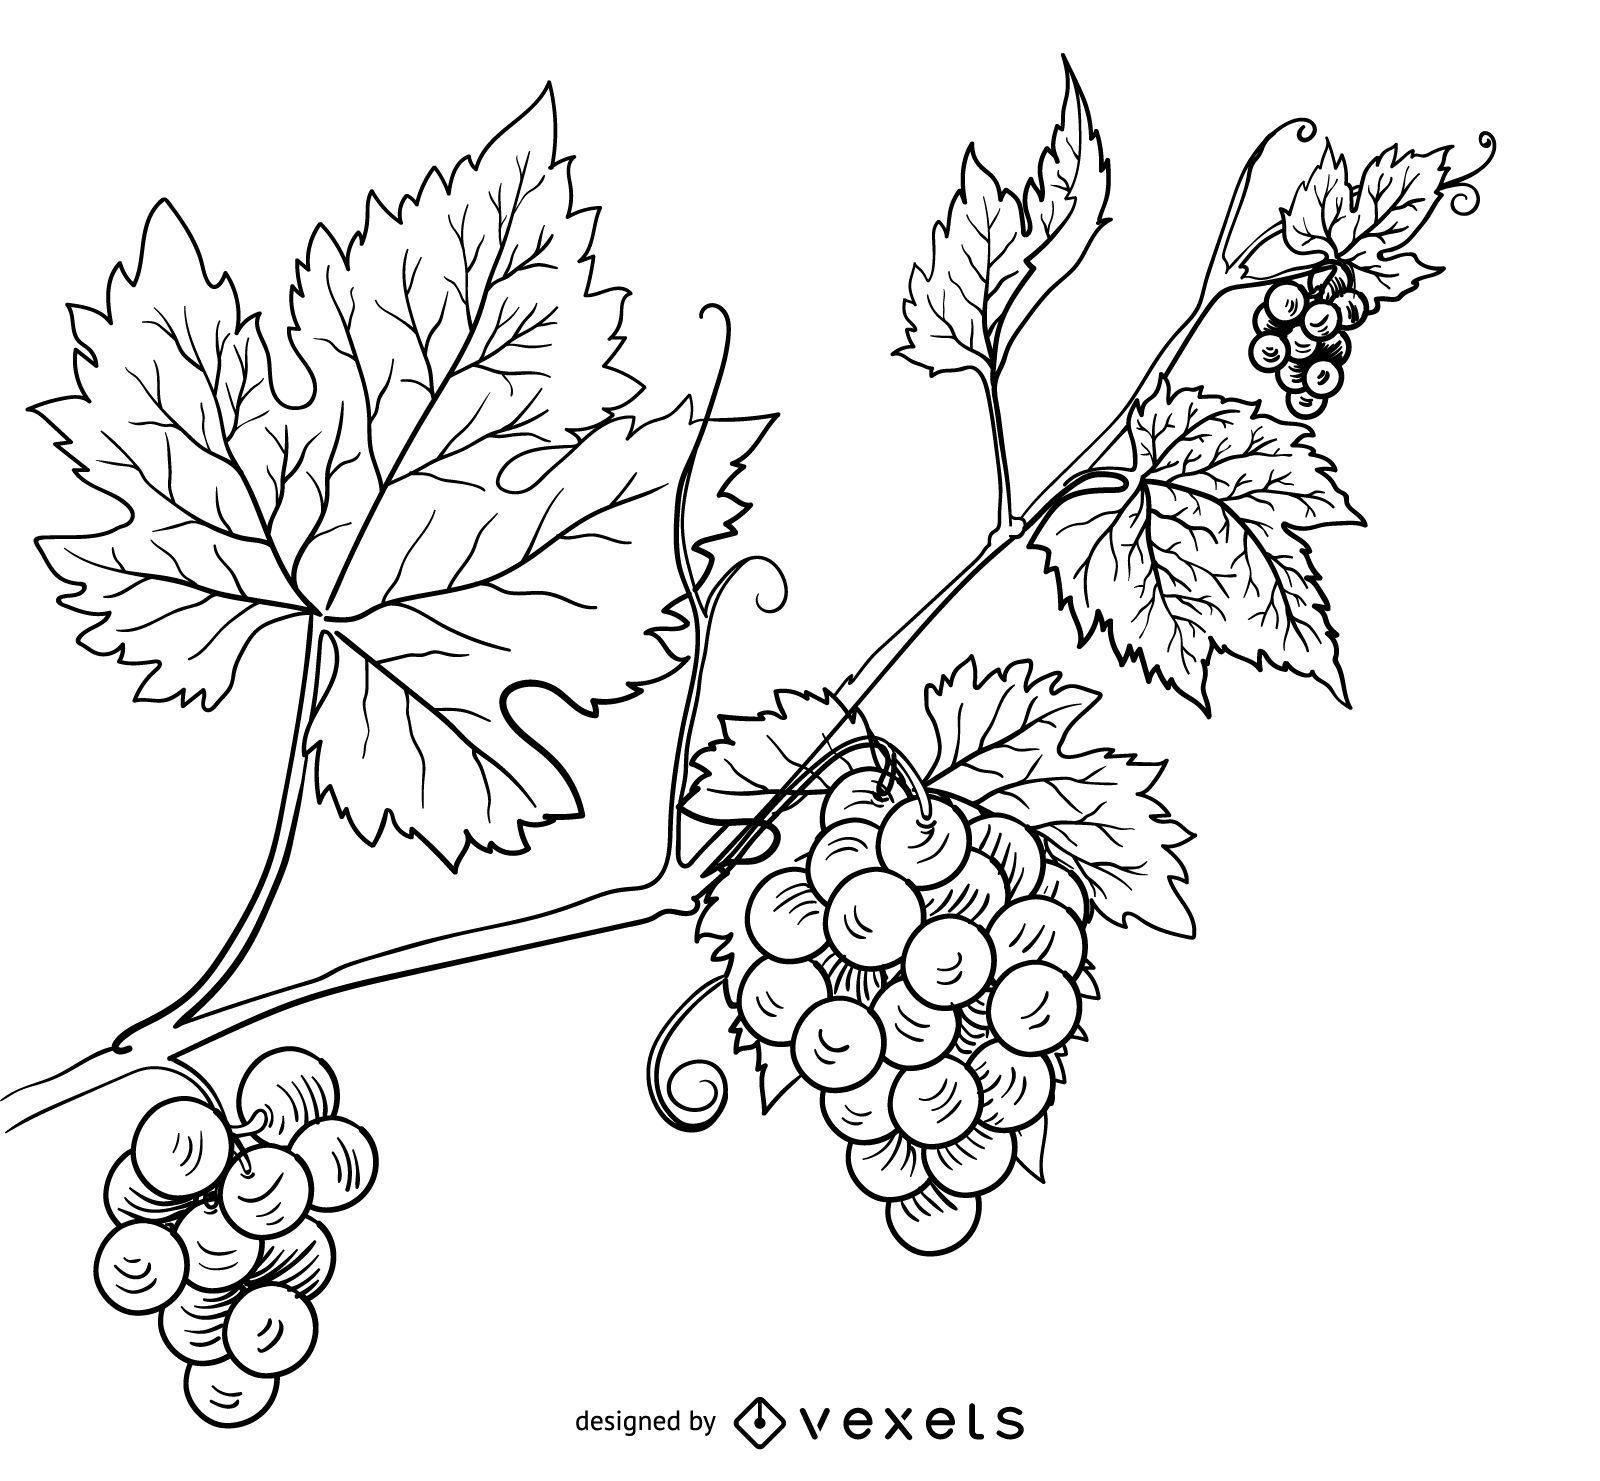 Grape vine hand-drawn illustration